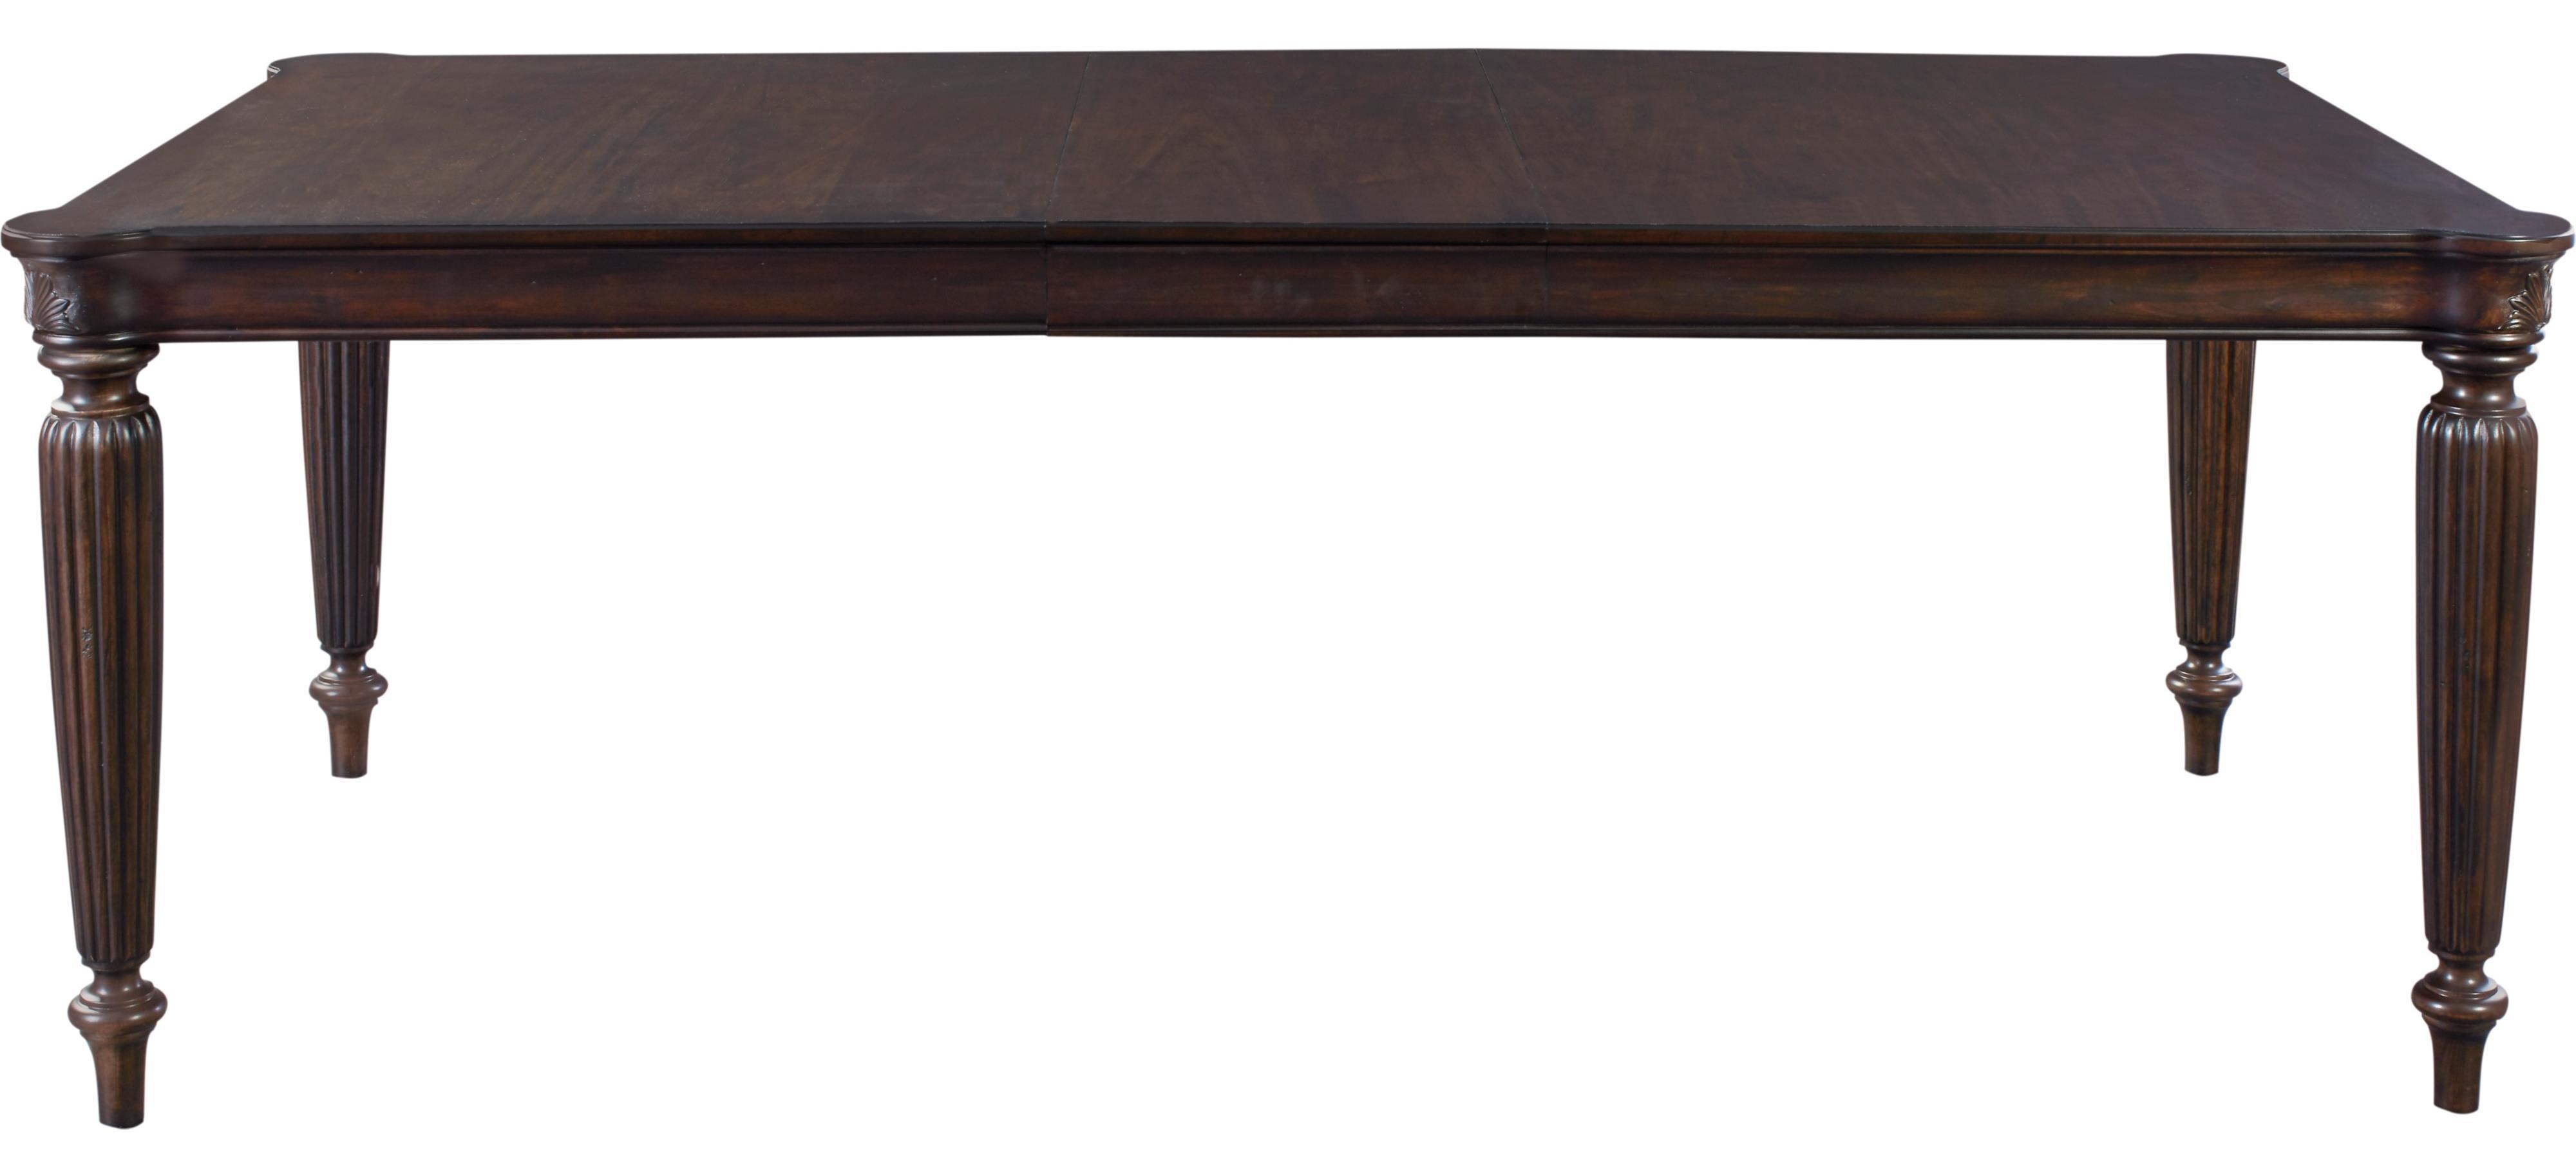 Broyhill Furniture Jessa Rectangle Leg Table - Item Number: 4980-542